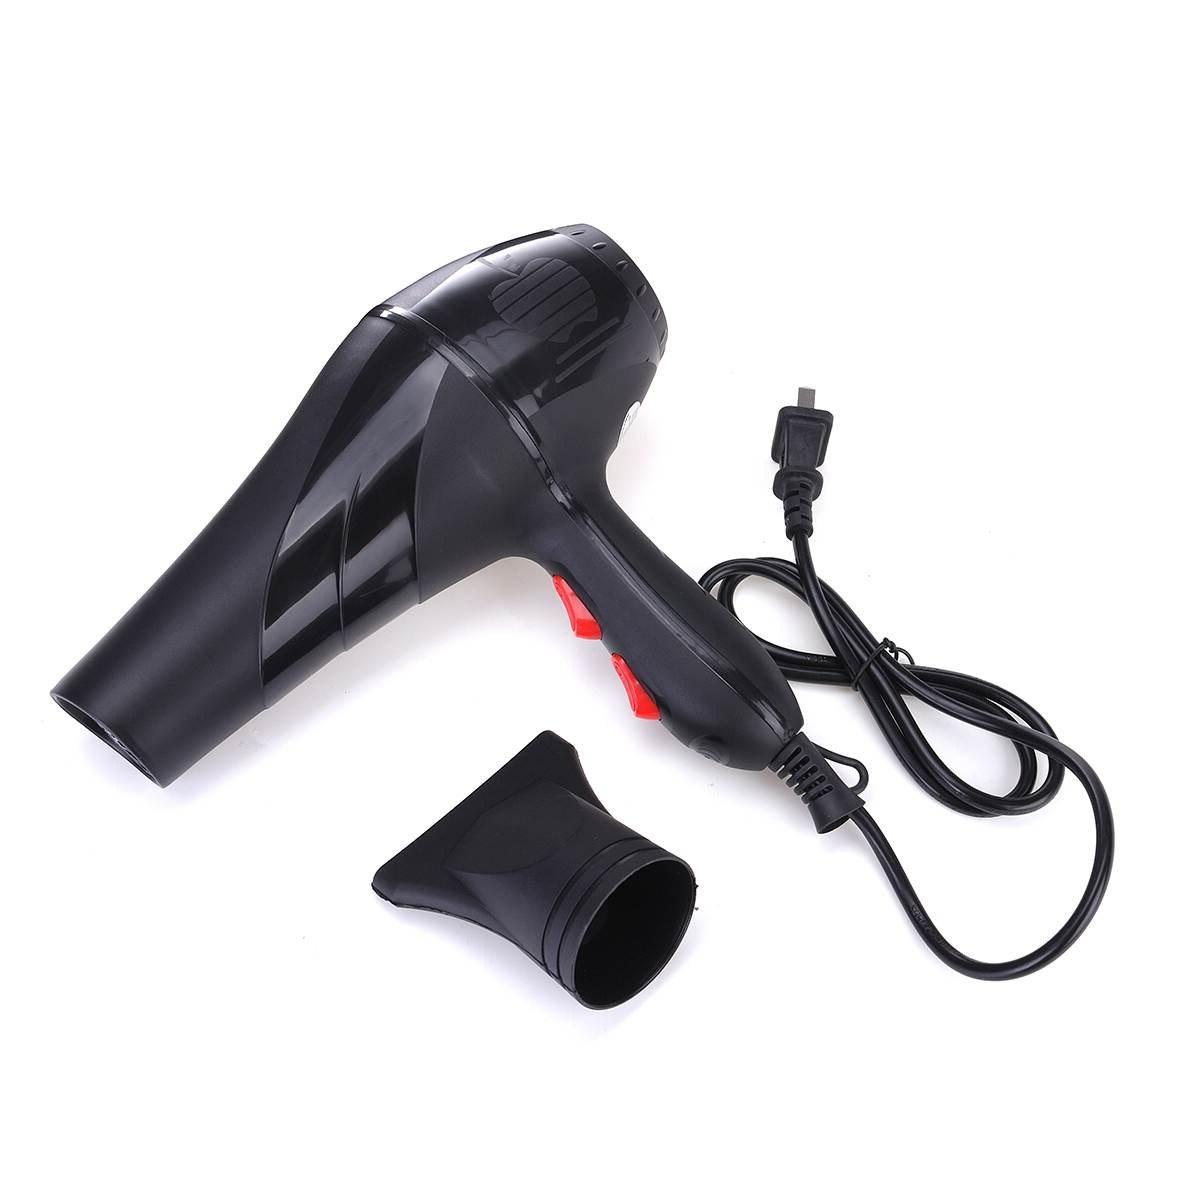 Professional 2000W Hair for Hairdressing Barber Home <font><b>Blow</b></font> <font><b>Dryer</b></font> Thermostatic Hair <font><b>Dryer</b></font> Fan